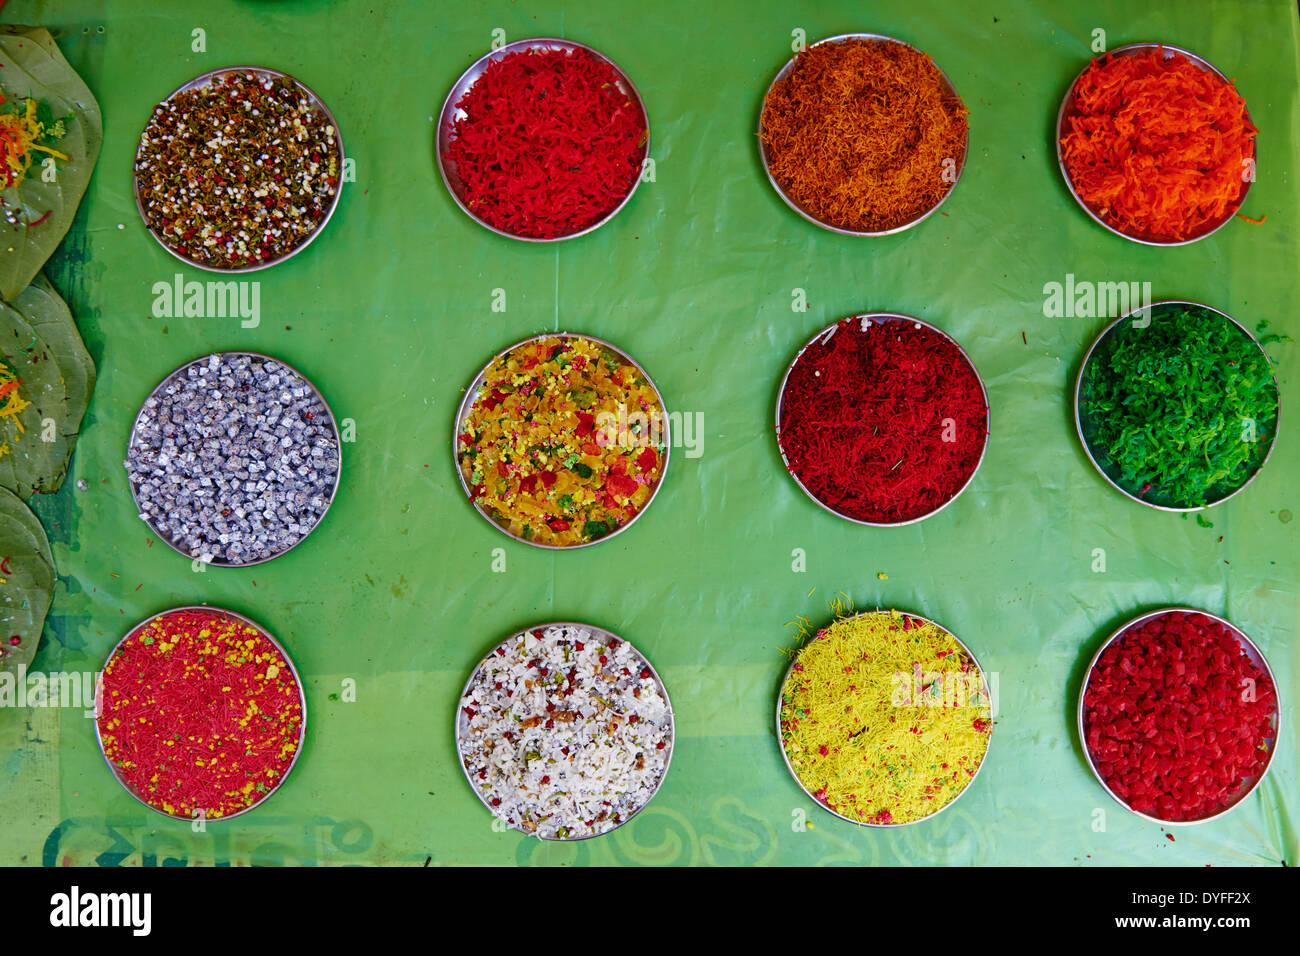 India, West Bengal, Kolkata, Calcutta, ingredient for betel - Stock Image